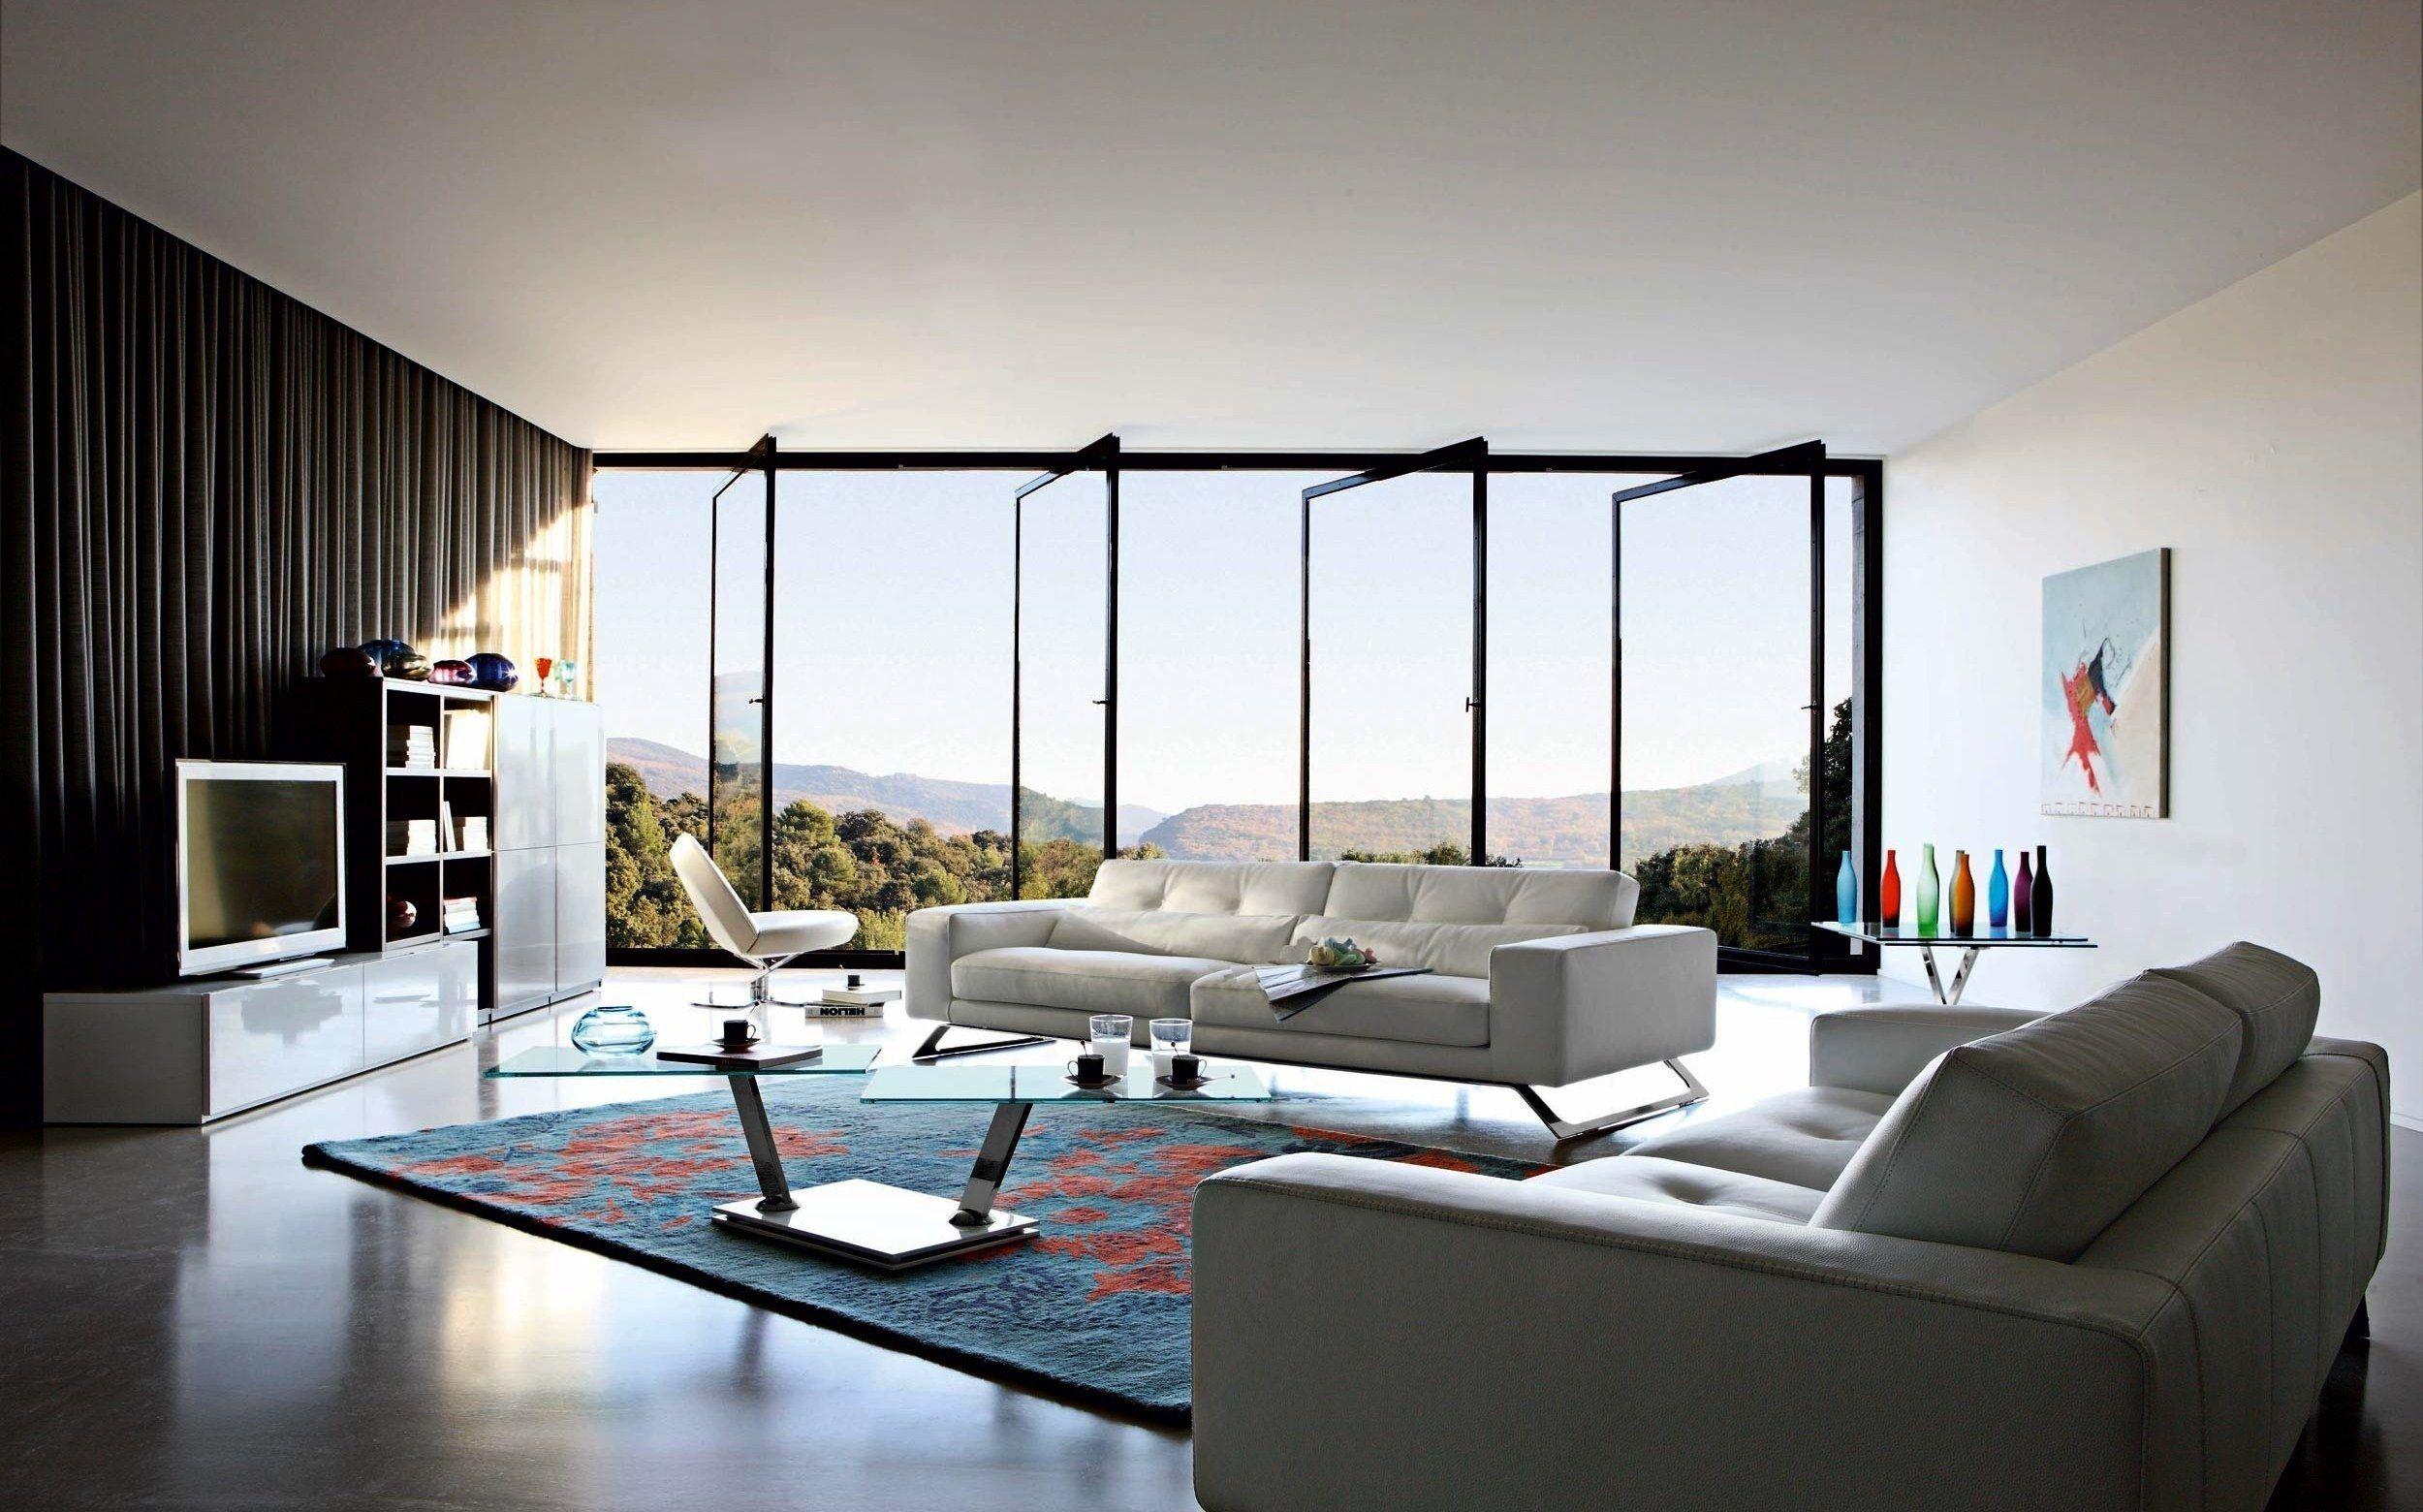 coastal living rooms design gaining neoteric. Neoteric Carpets Interior Design Gaining Antique Room Appearance . Coastal Living Rooms